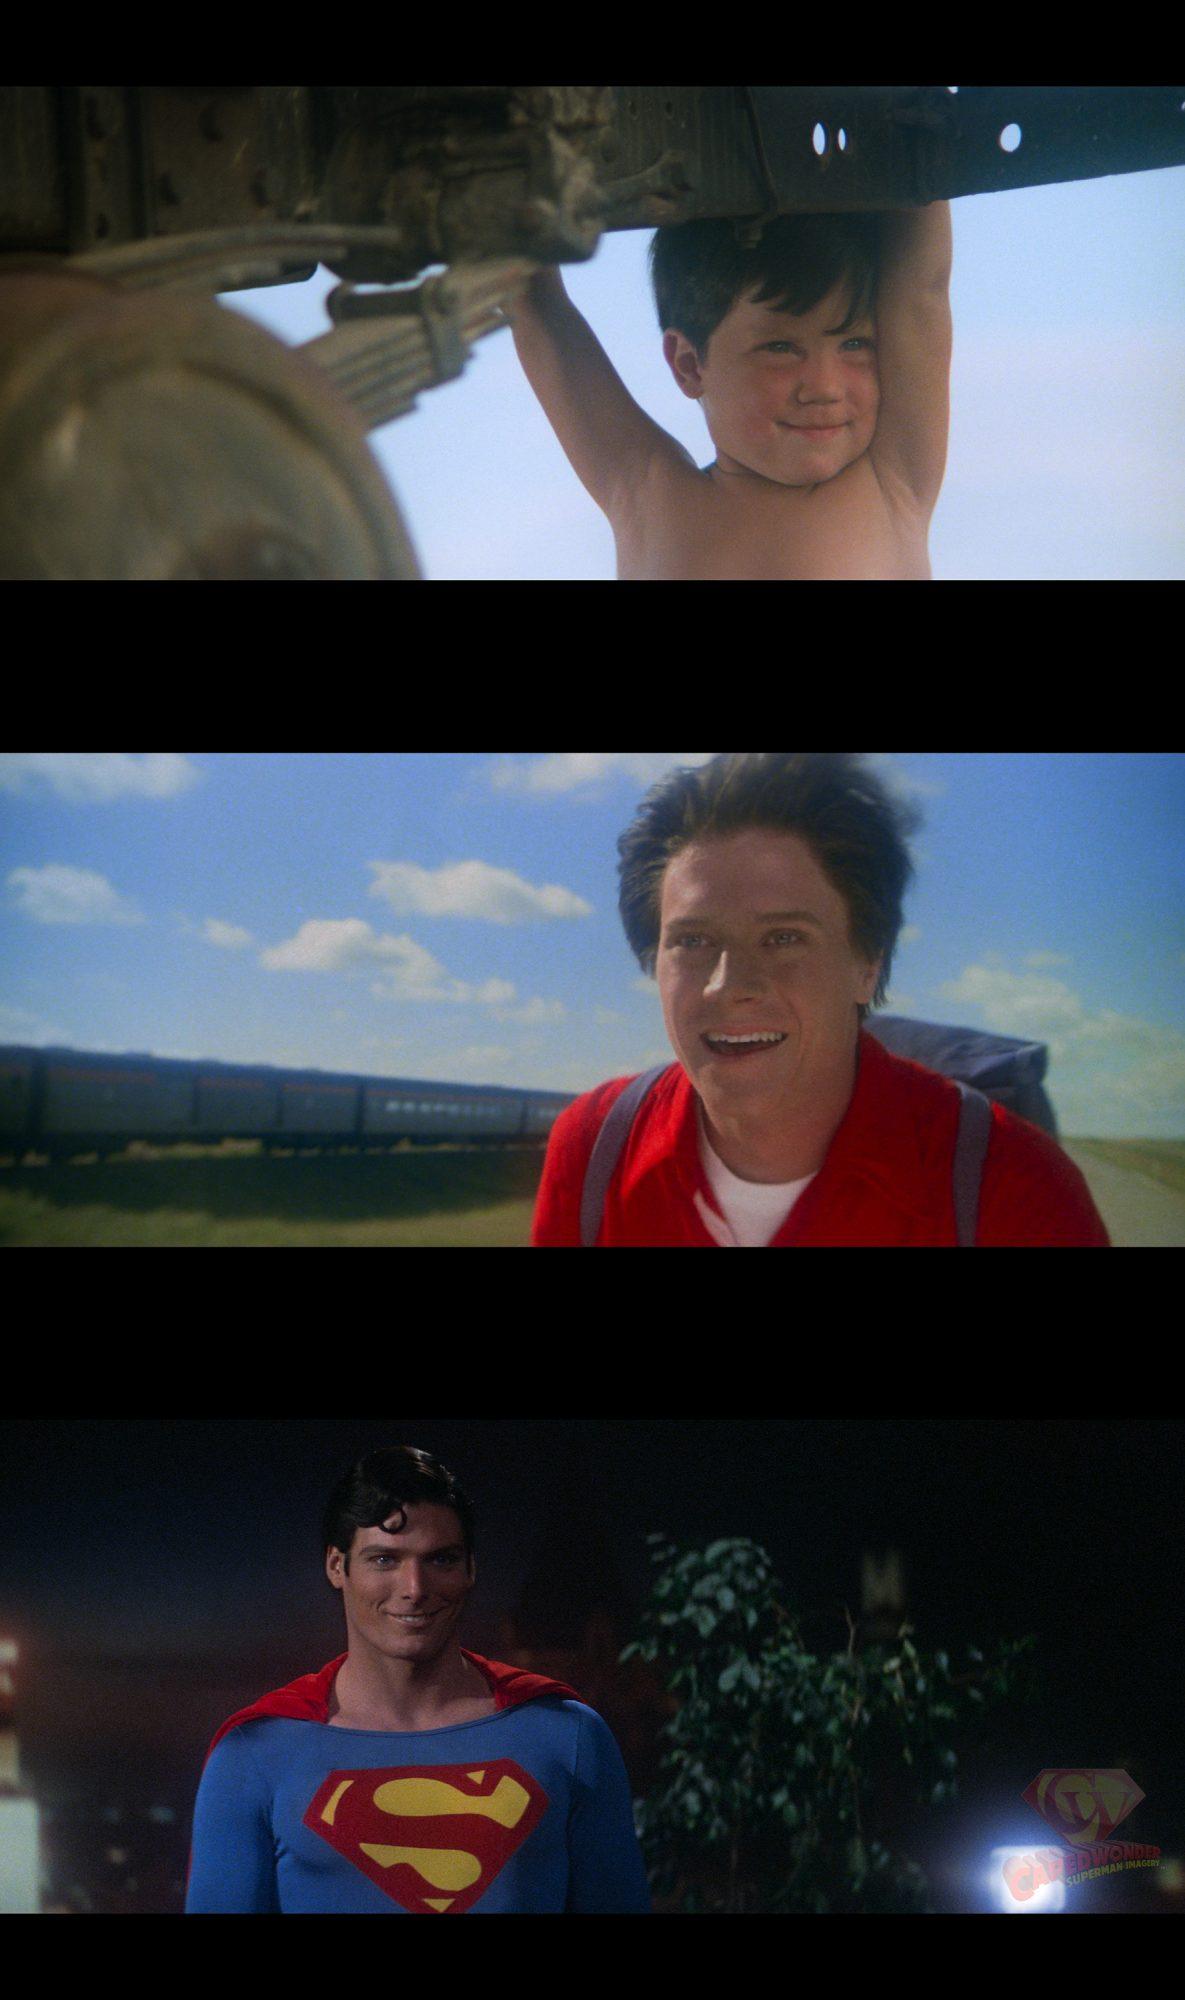 SUPERMAN-The Movie-4k.trio